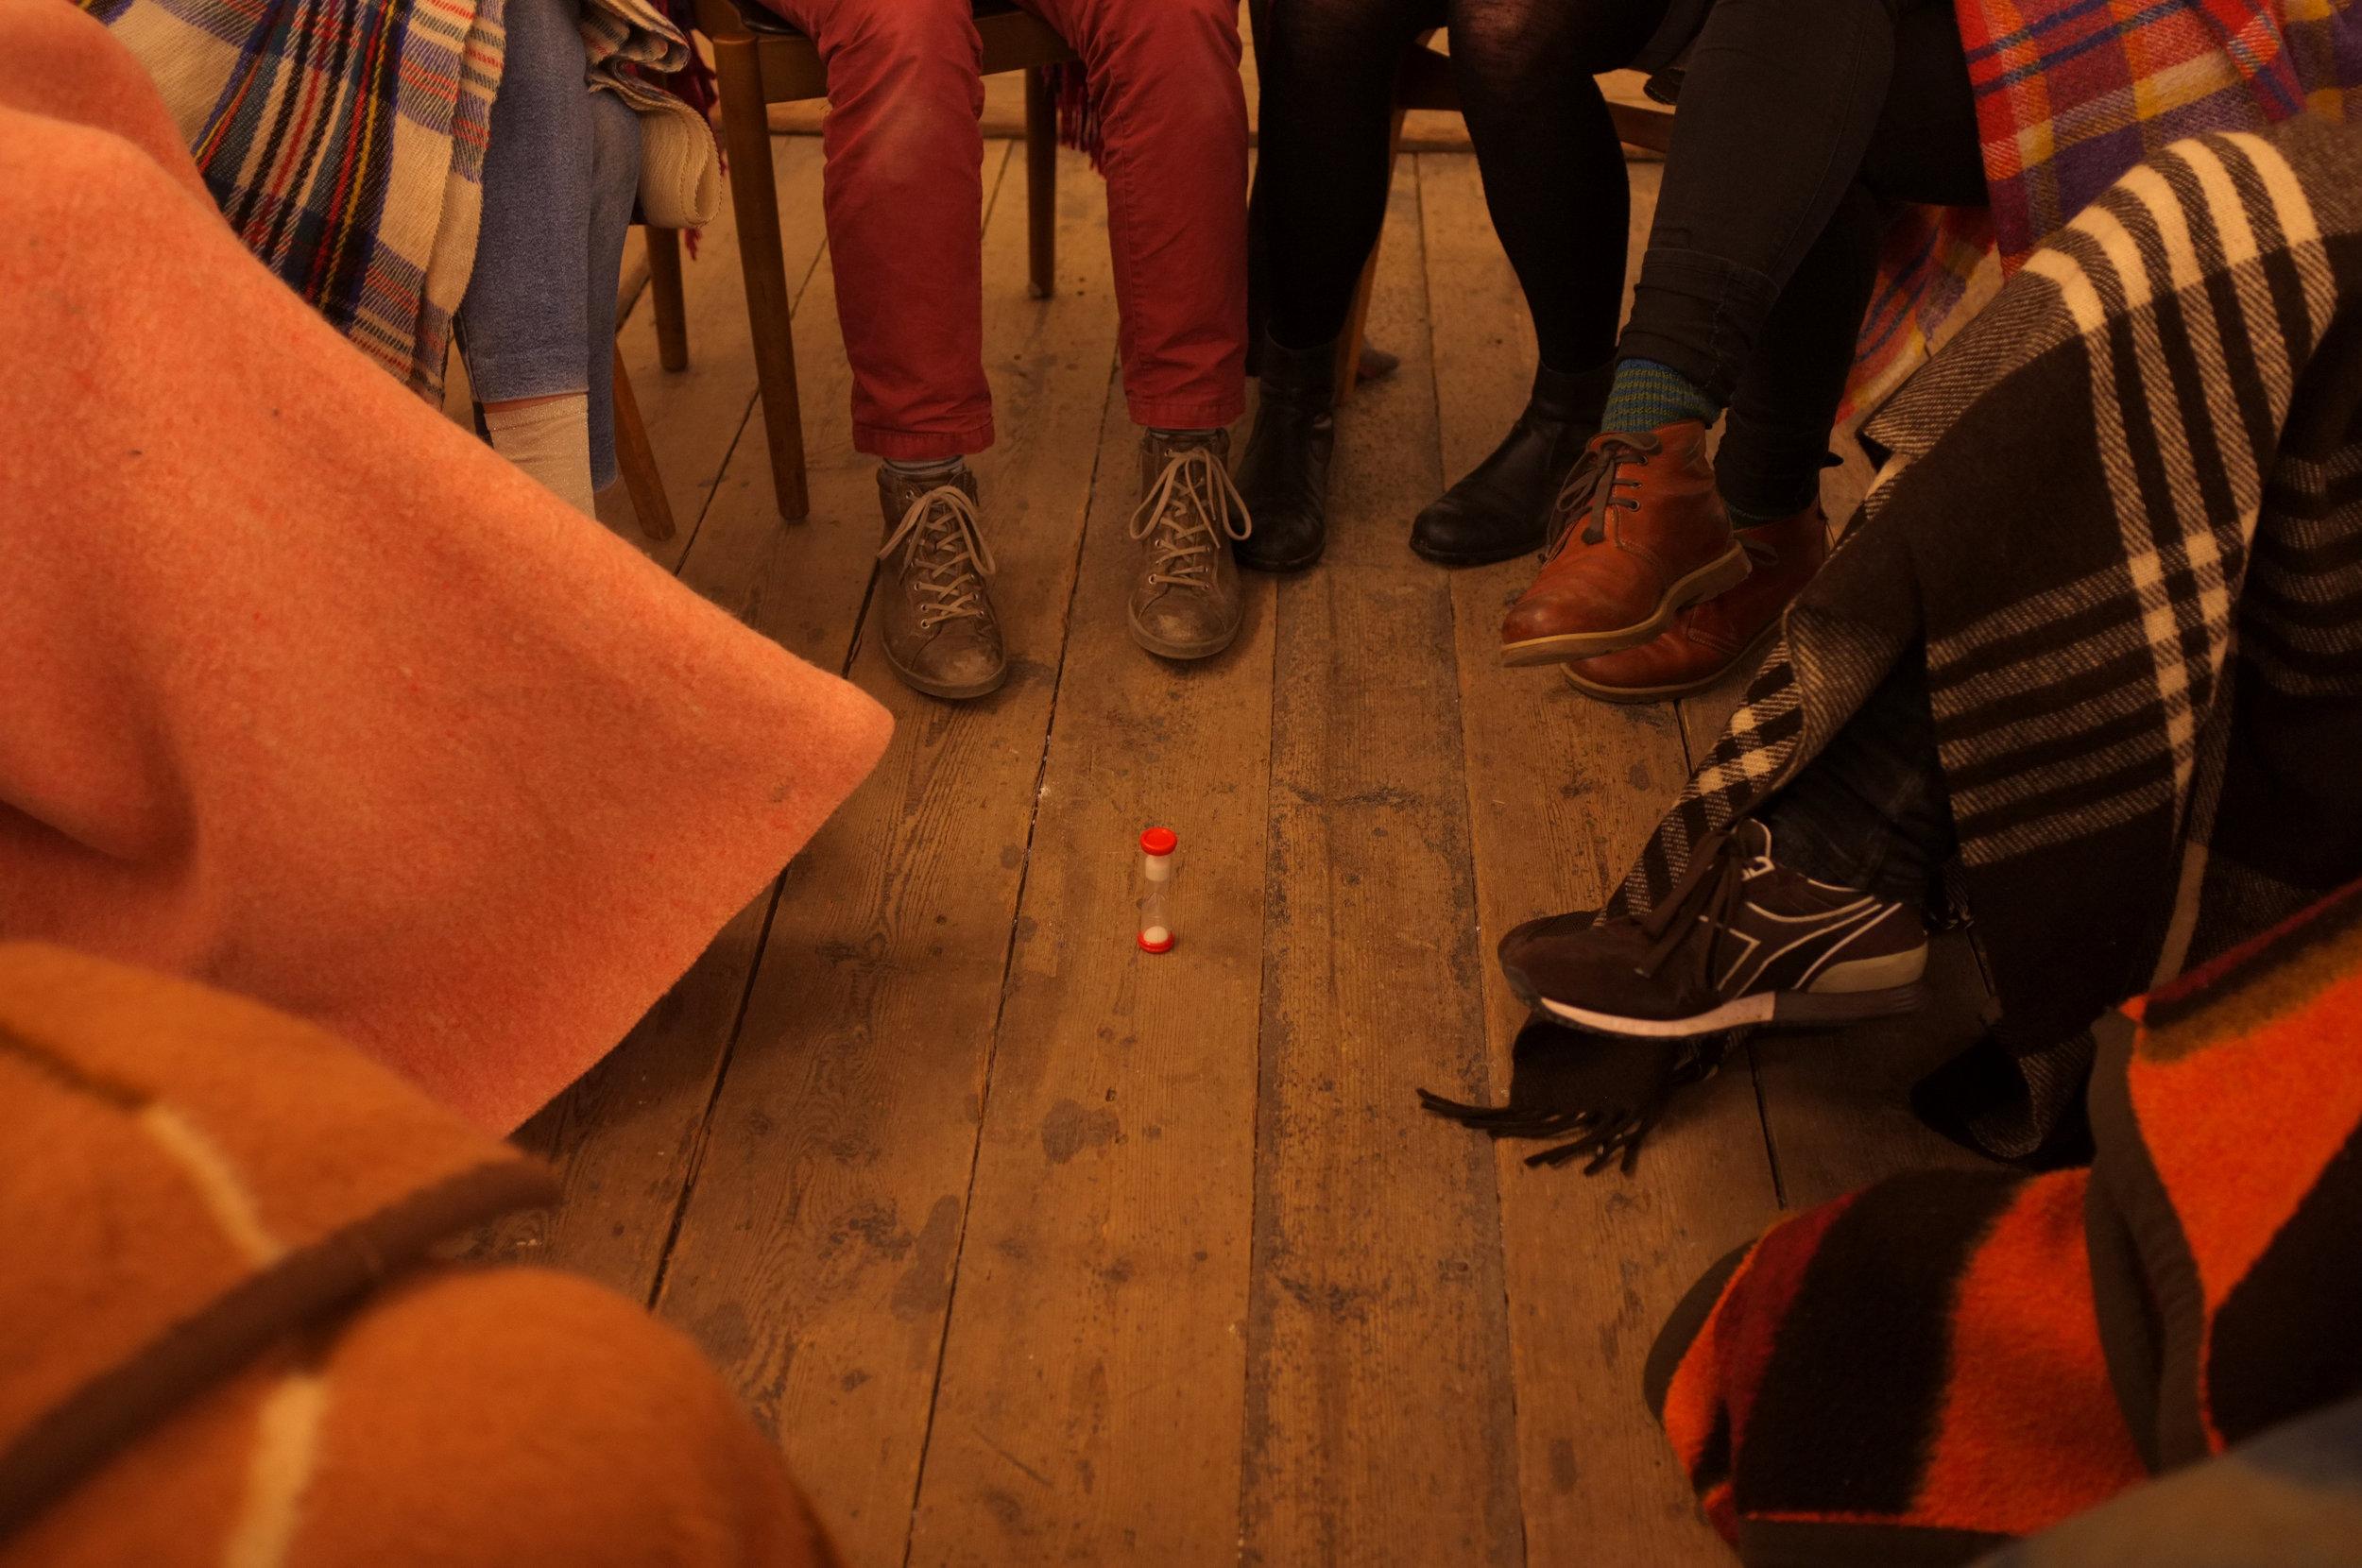 Frisk Flugt - Growing Silent. Hannah Anbert performance at New Shelter Plan, 2015